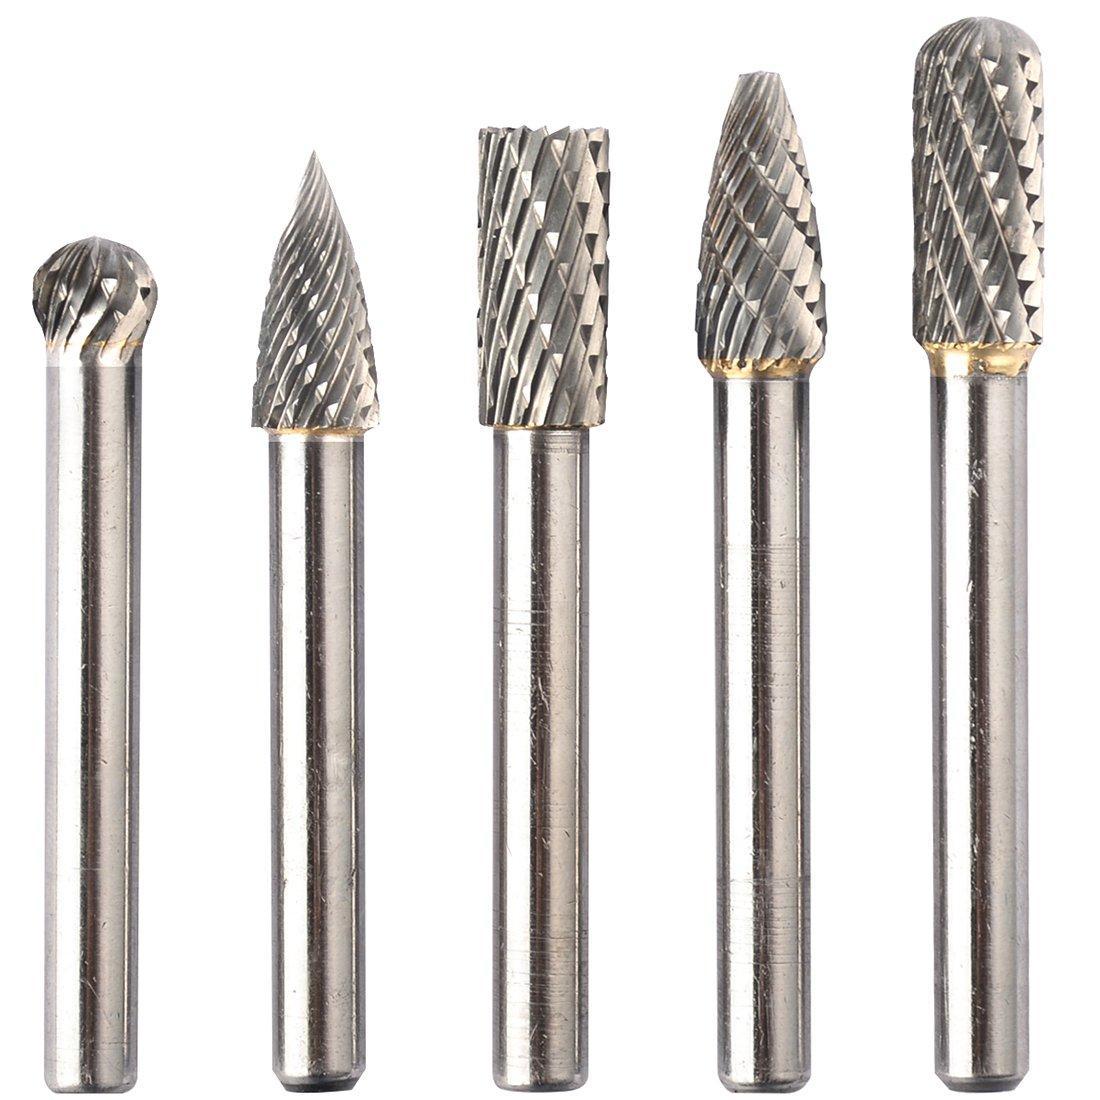 KOTVTM 5Pcs 8MM Head Tungsten Carbide Rotary Burr Set Die Grinder Bit 1/4-Inch Shank Grinder Drill Rotary Burrs Cutting Burs Metal Polishing